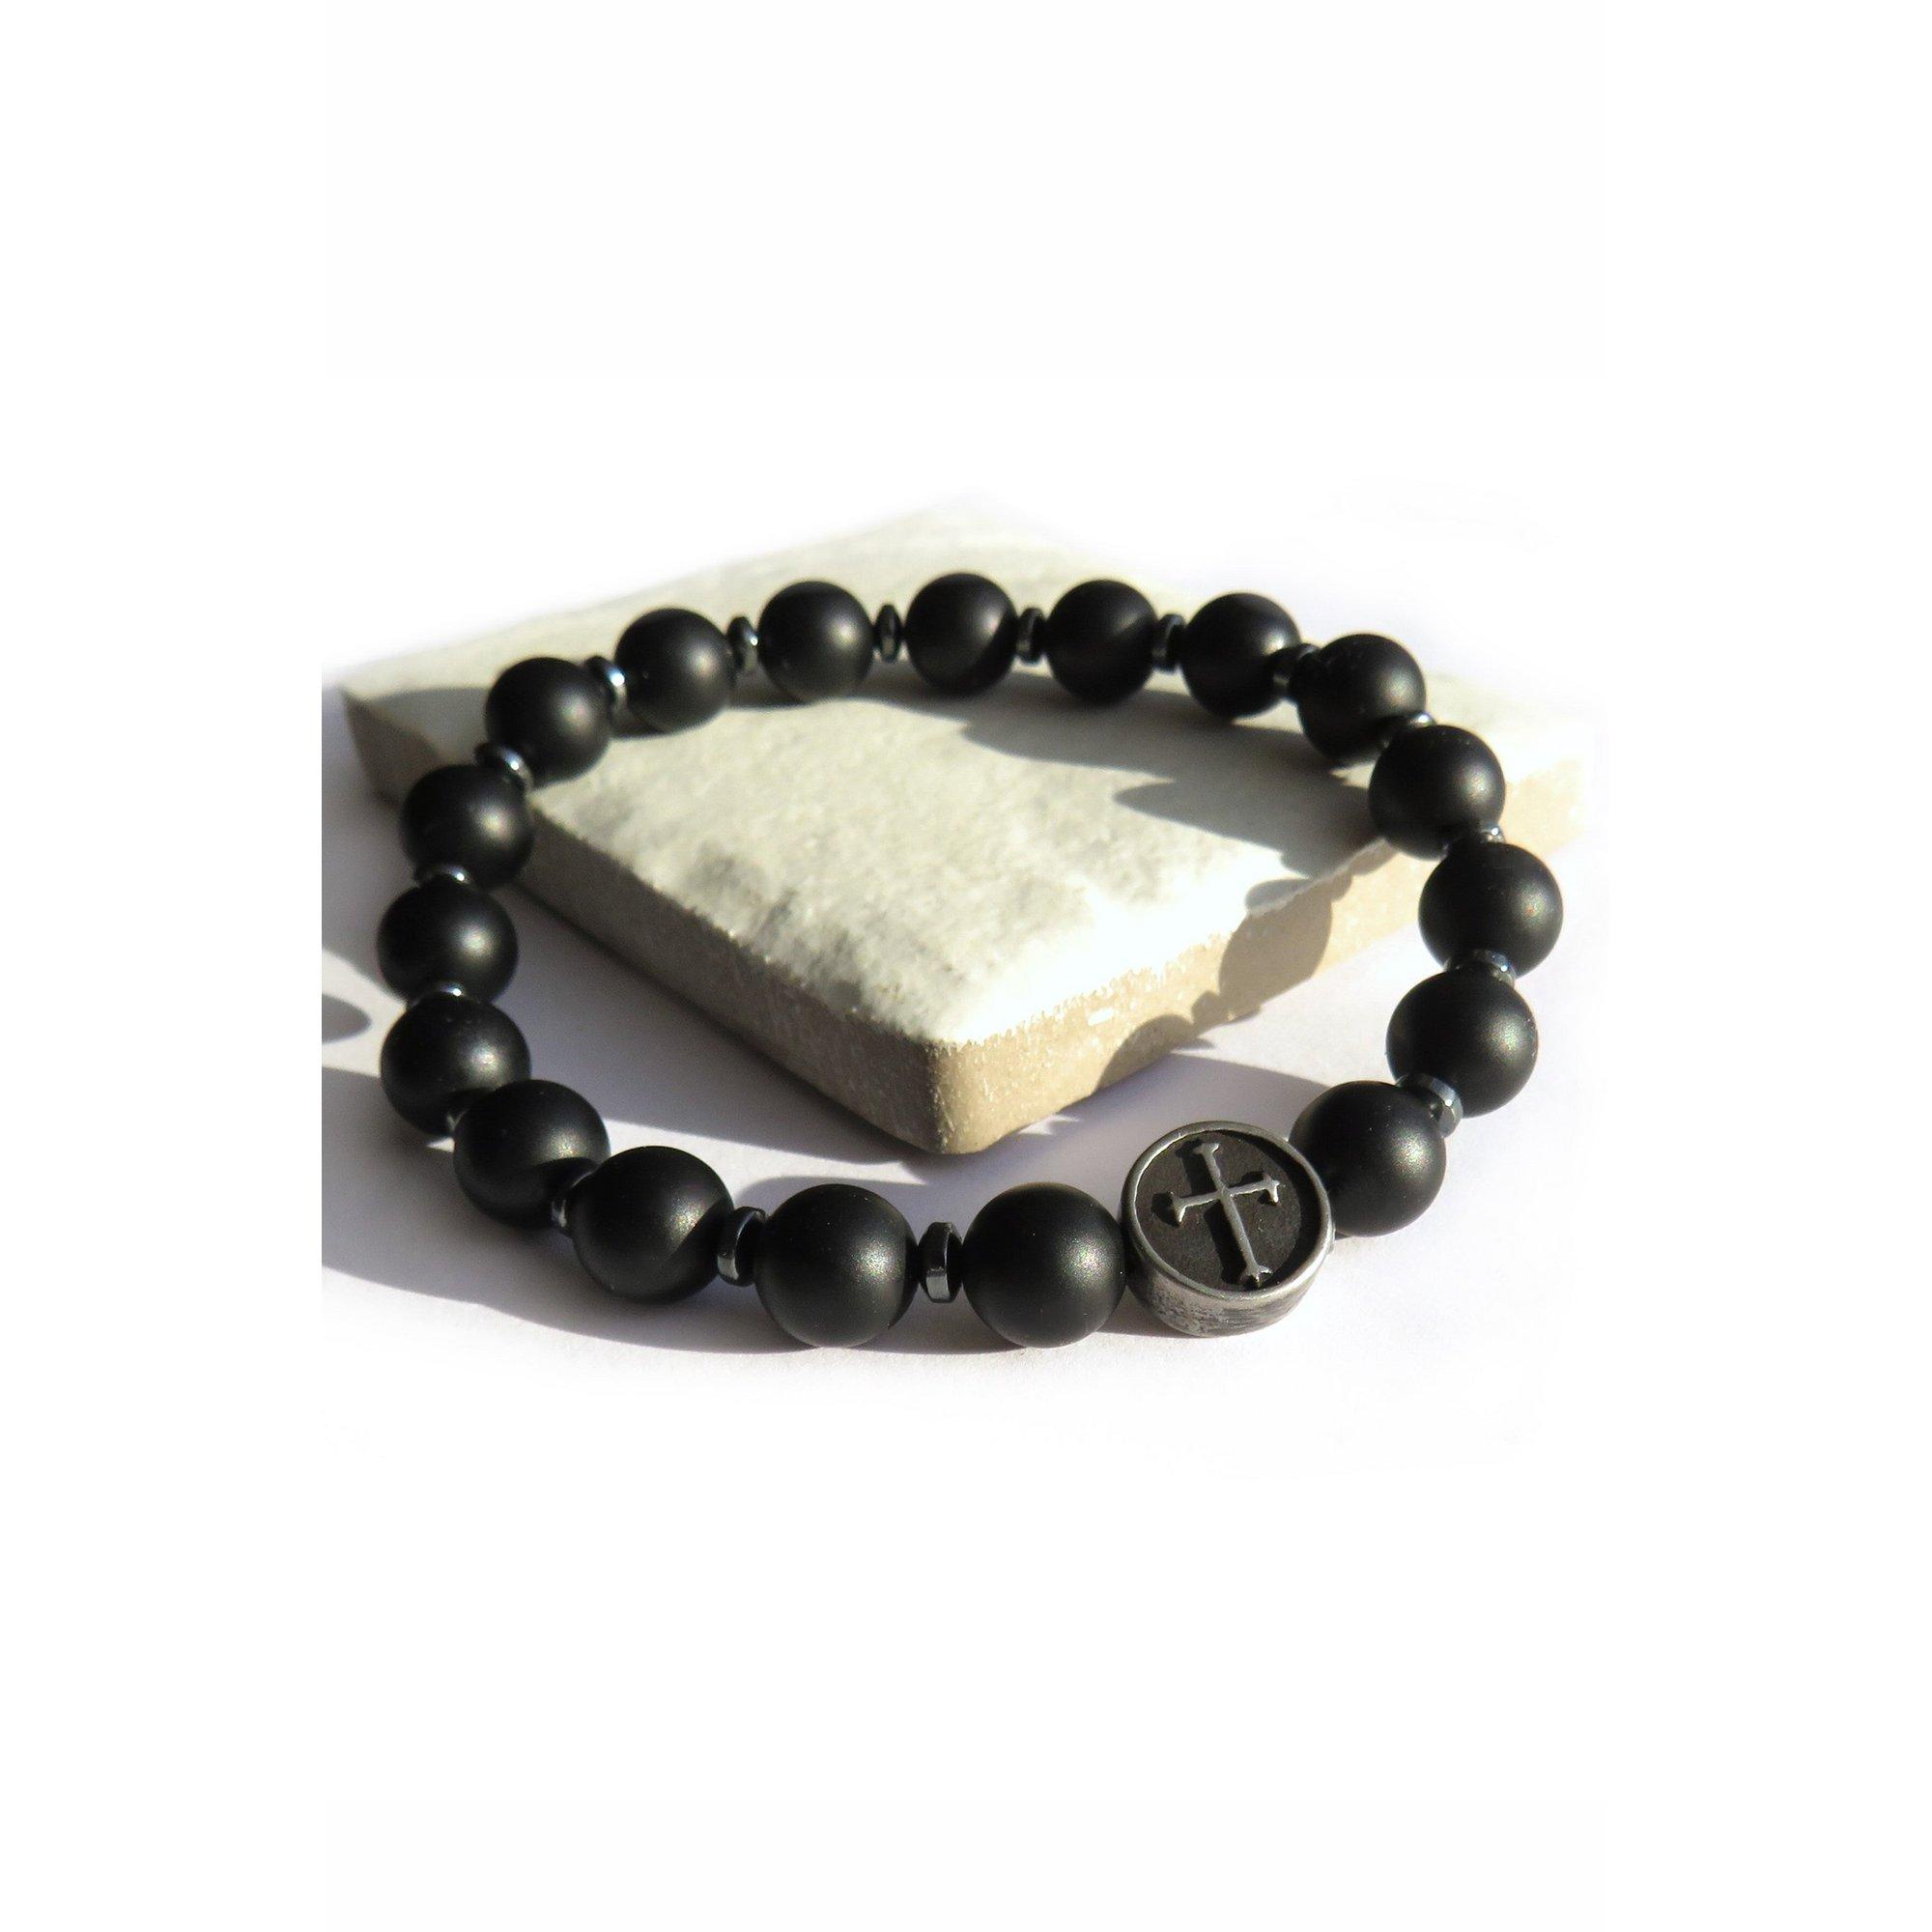 Image of Black Agate and Cross Bracelet